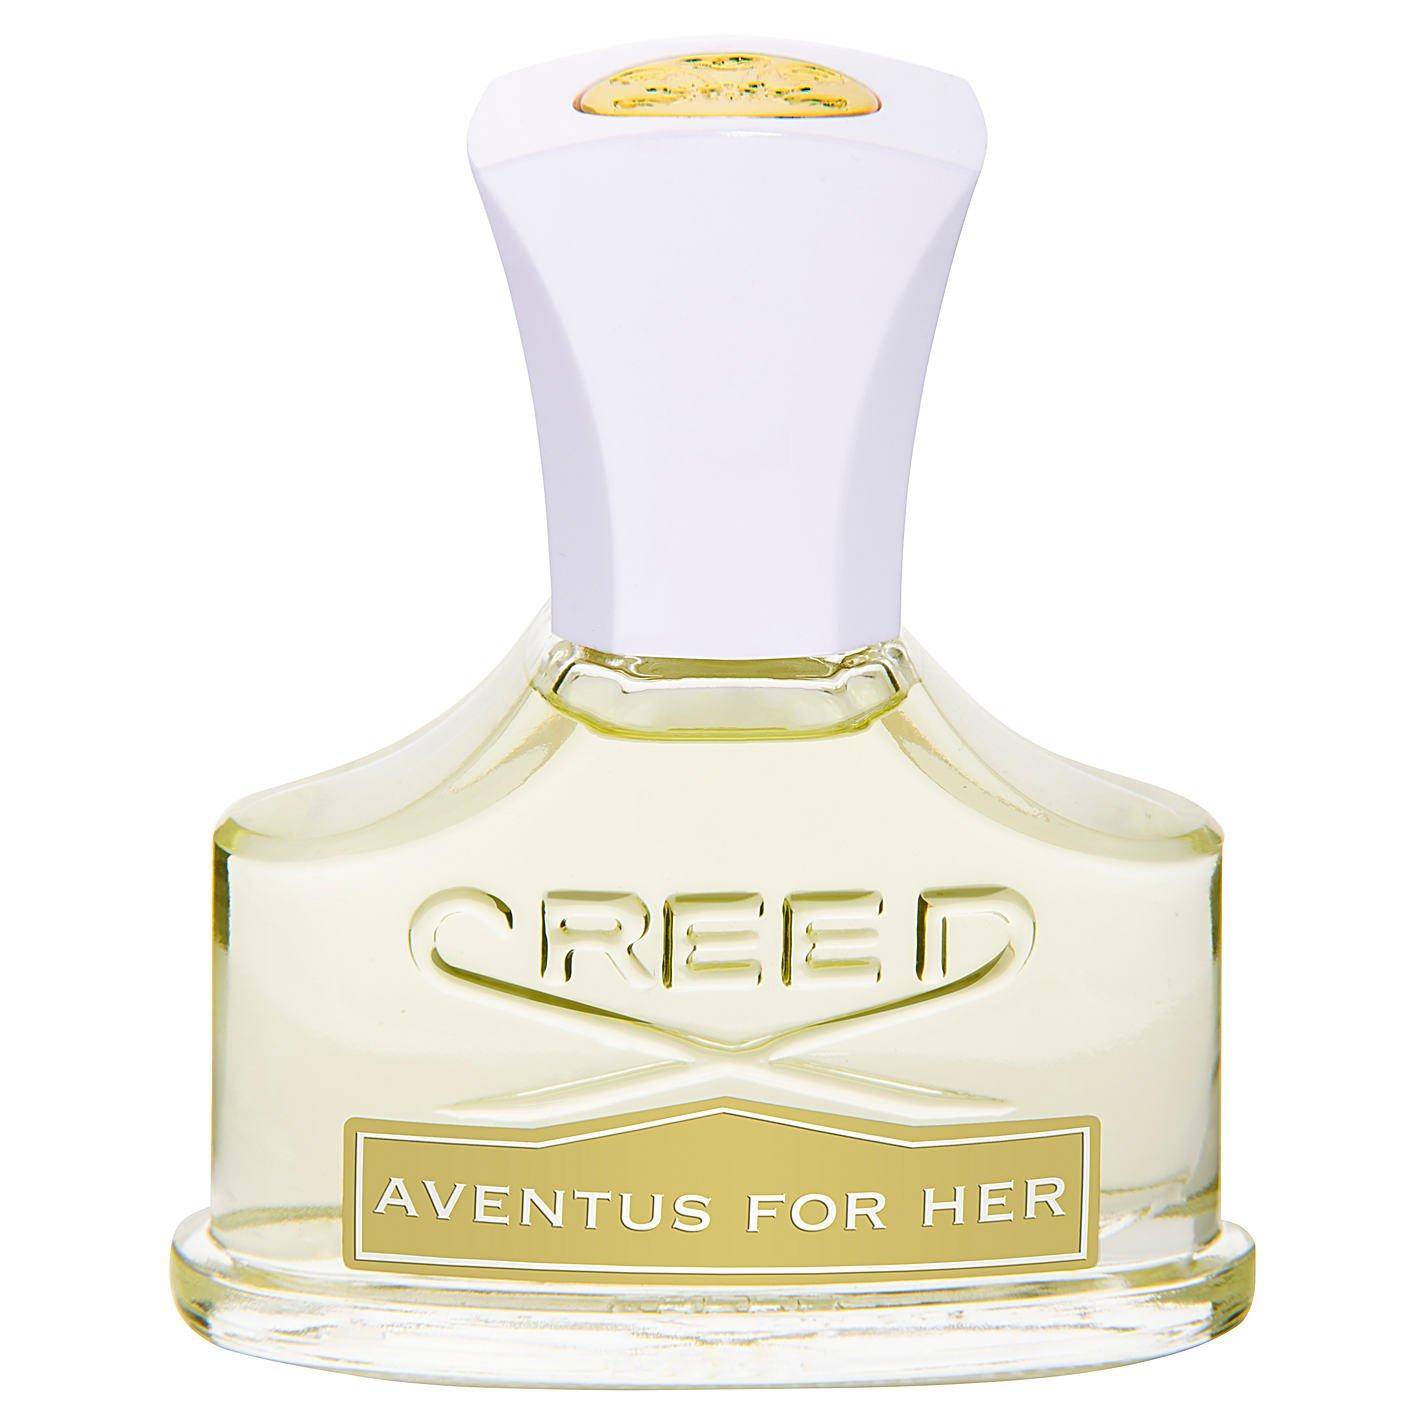 Creed Aventus For Her Eau de Parfum Spray 1.0 Oz / 30 ml New in Box